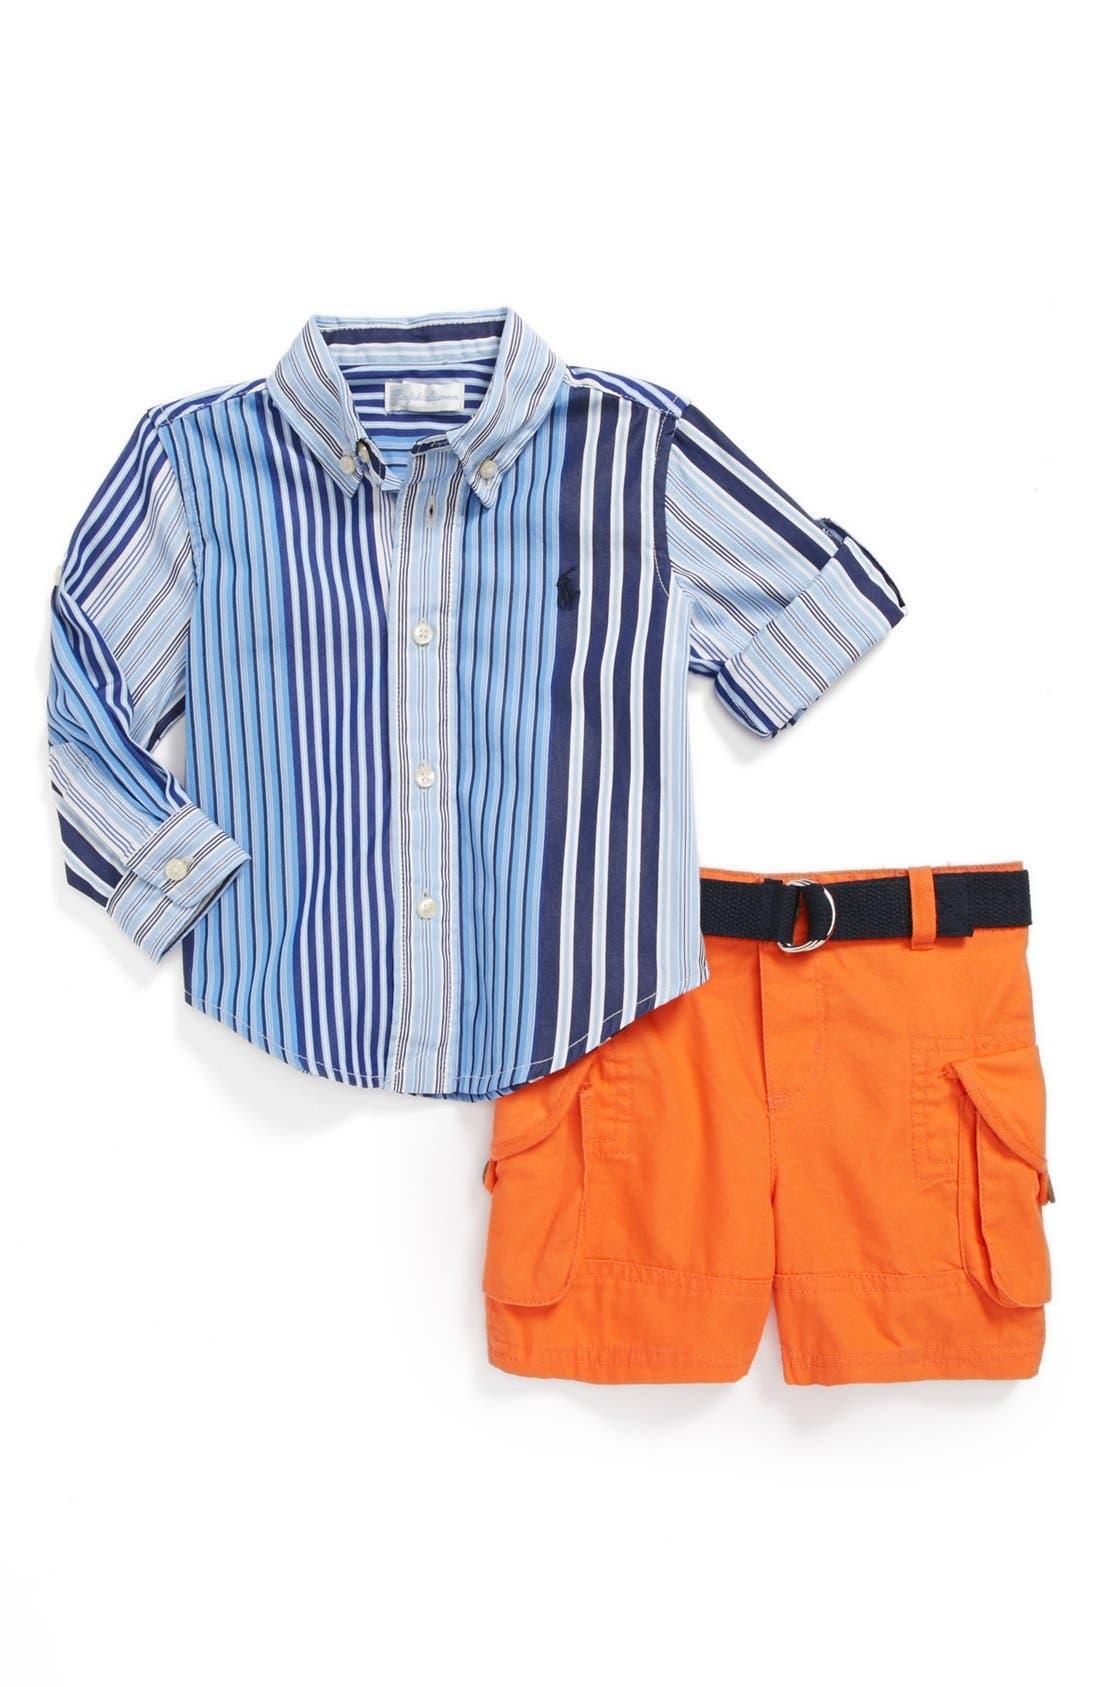 Alternate Image 1 Selected - Ralph Lauren Stripe Shirt & Cargo Shorts (Baby Boys)